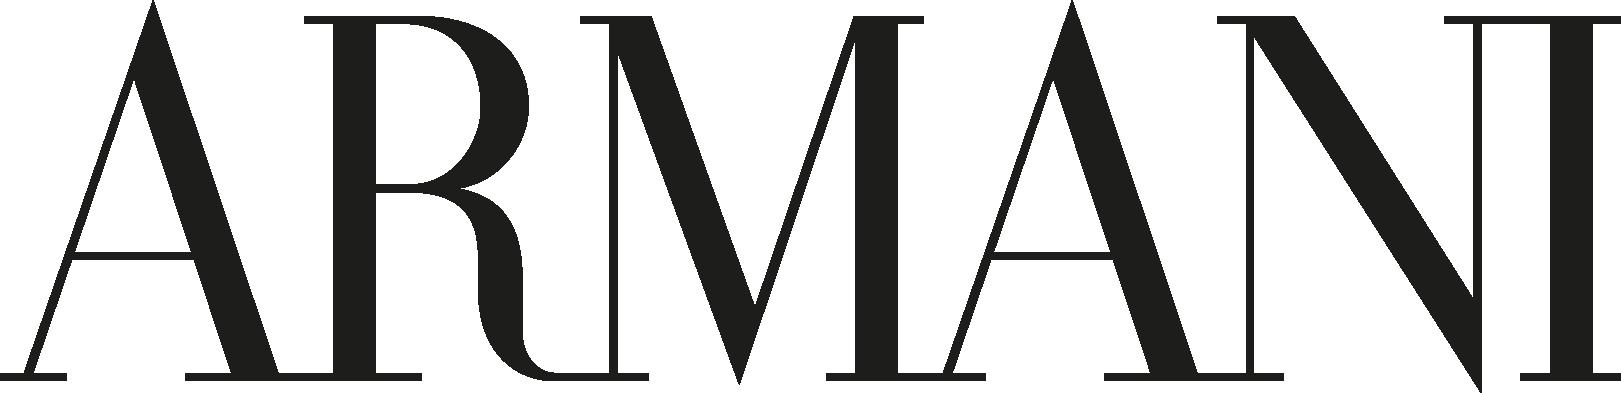 HD Emporio Armani Logo.